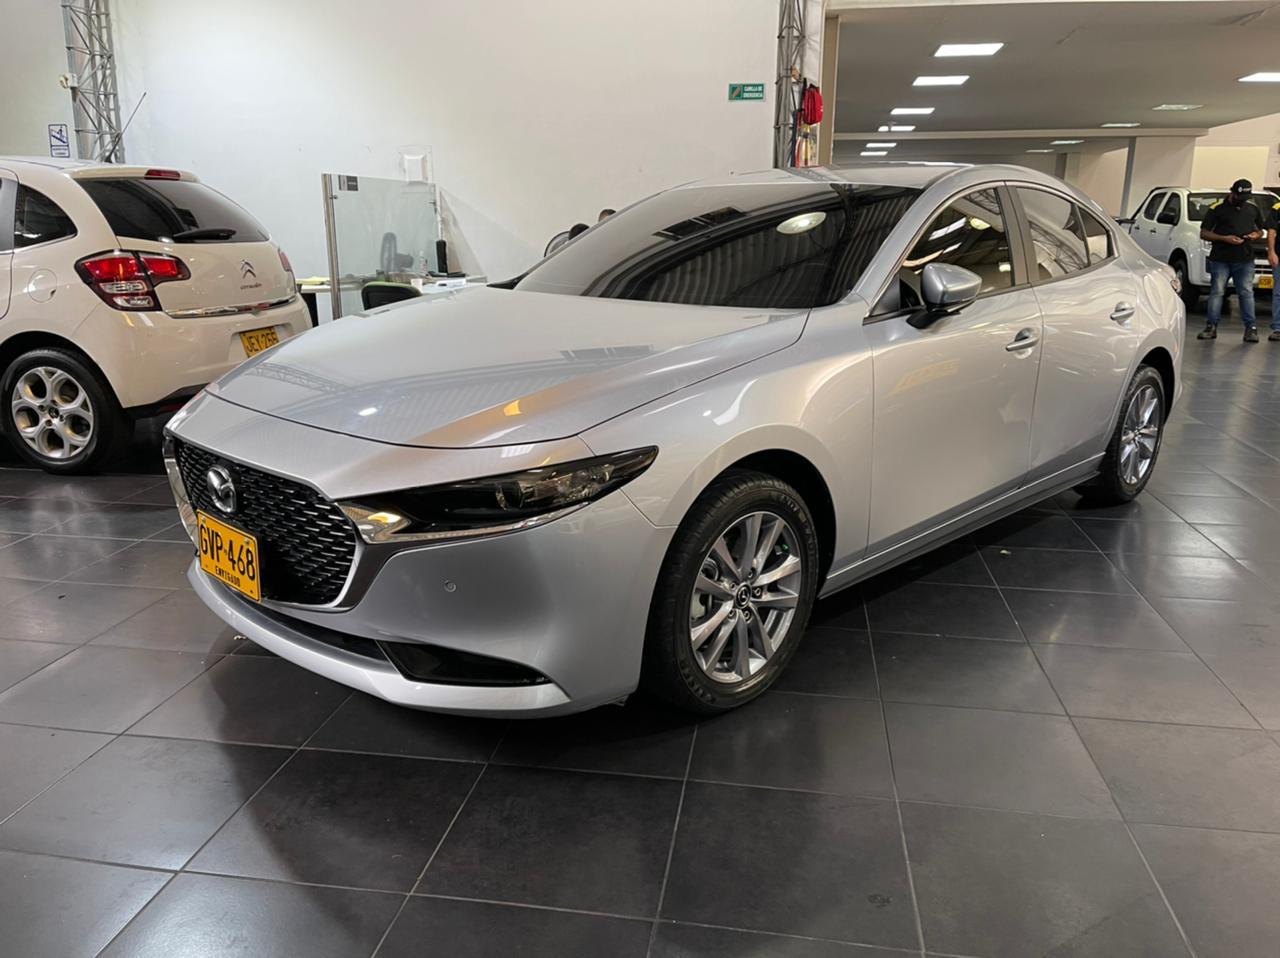 Mazda-3-Touring-05138729-1